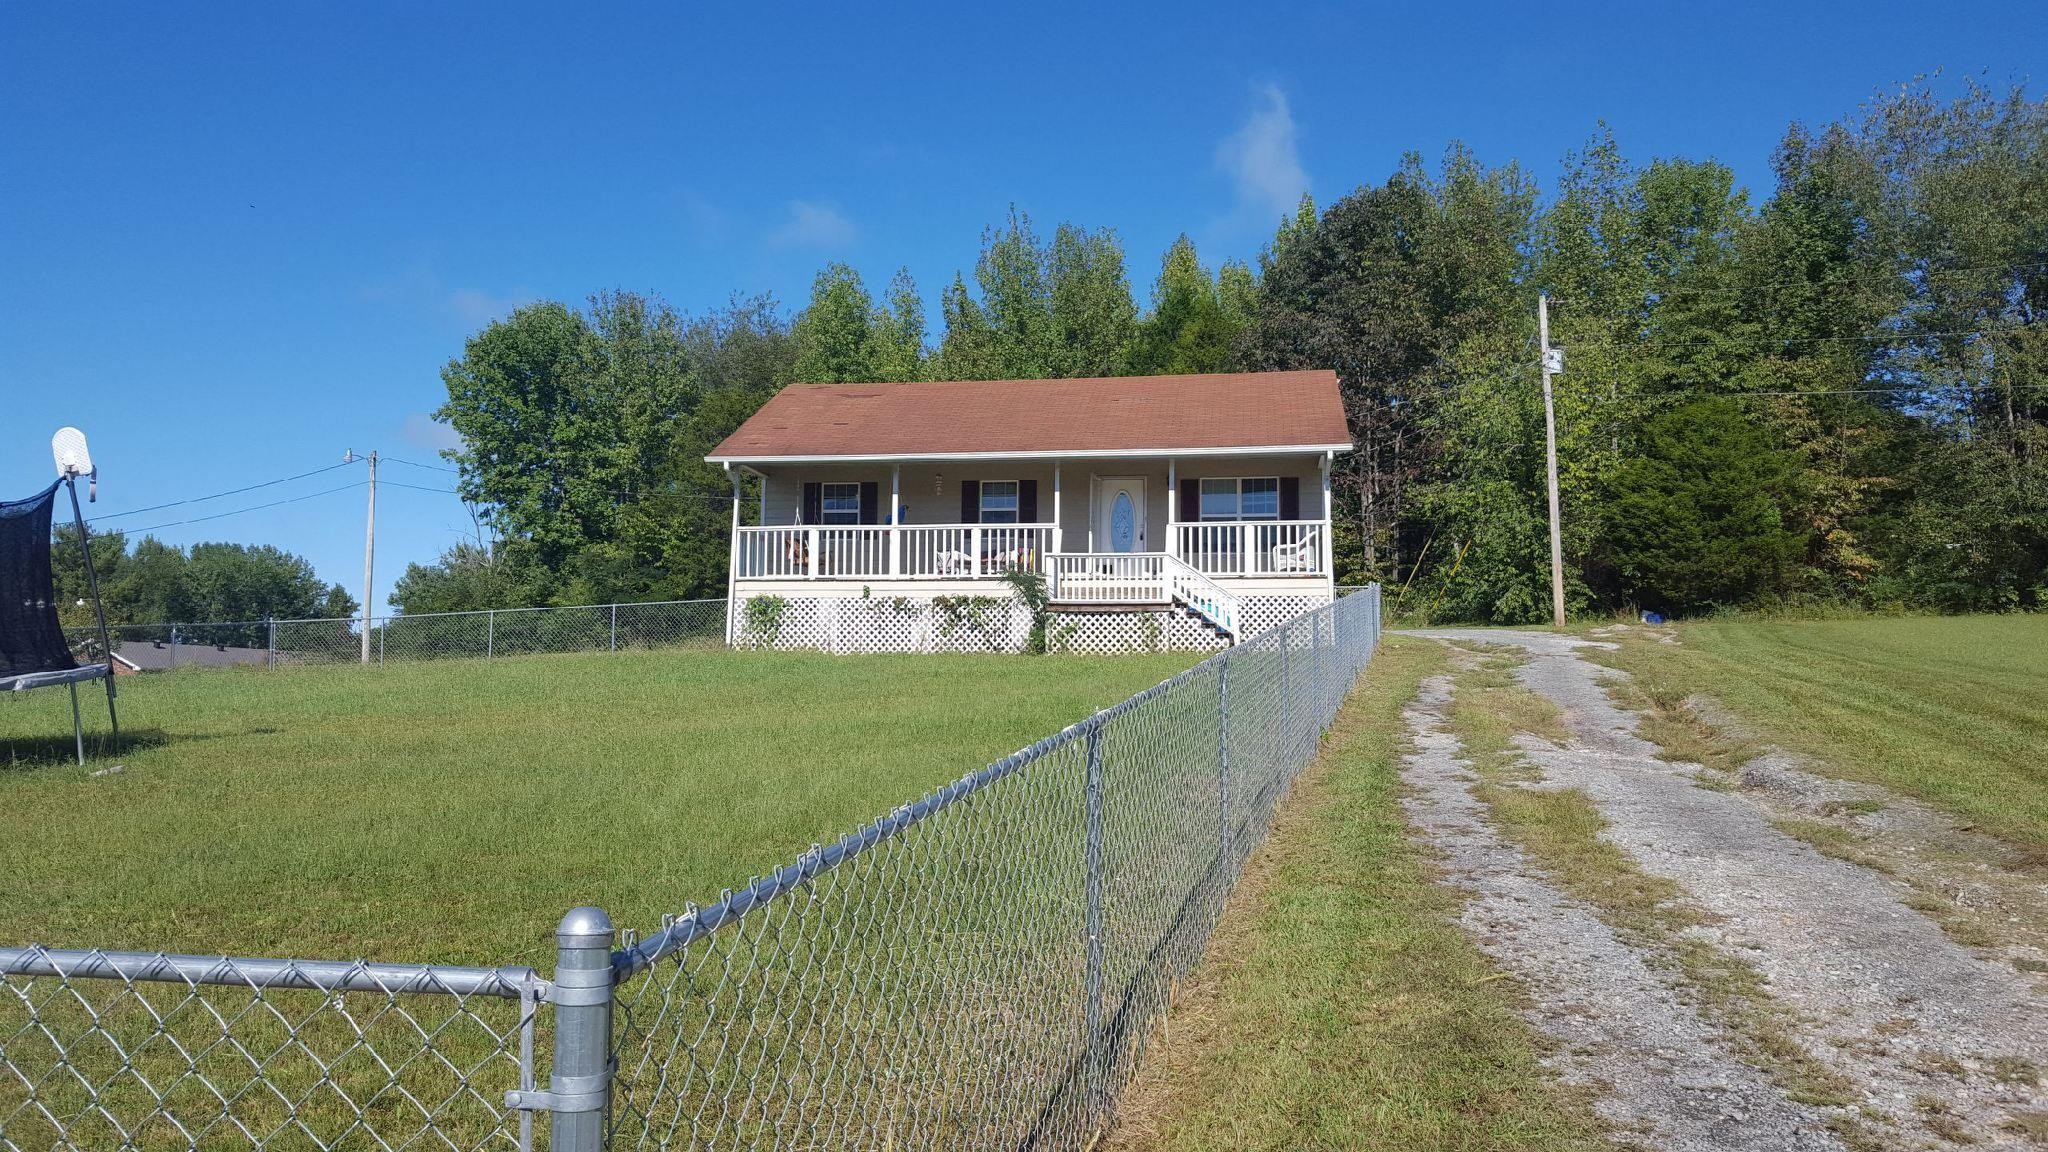 8160 Short Rd, Lyles, TN 37098 - Lyles, TN real estate listing